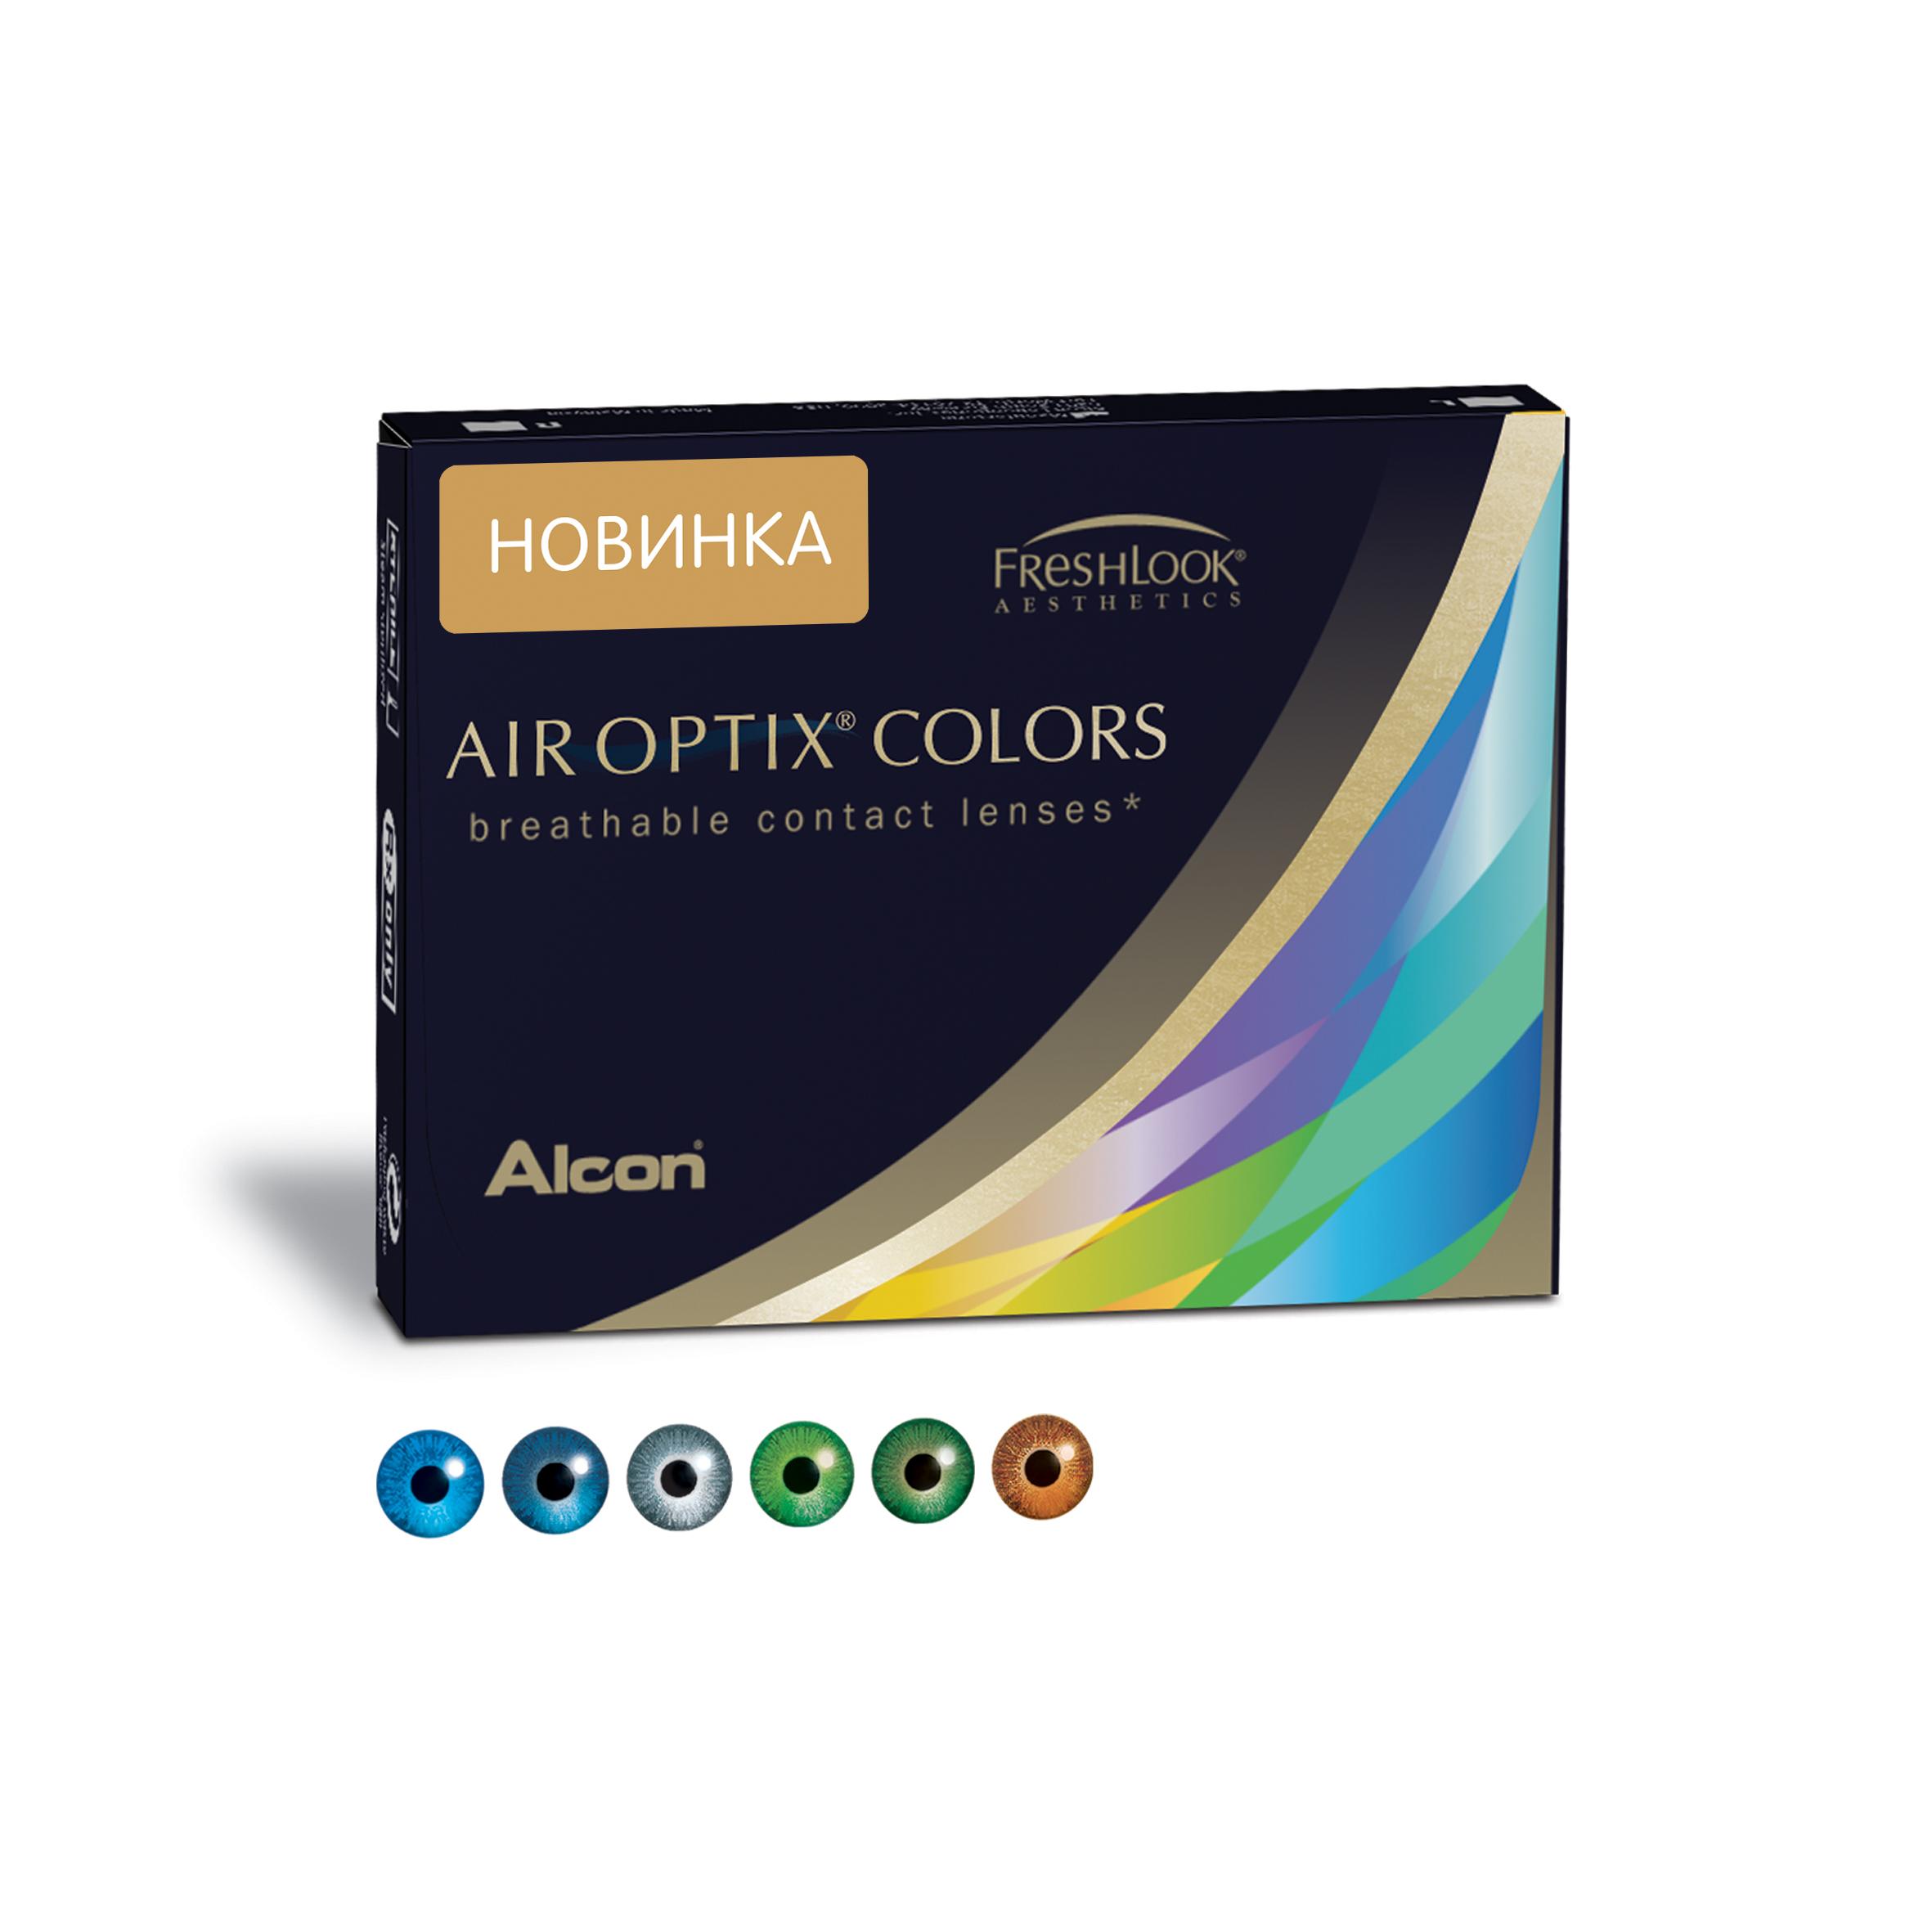 Аlcon контактные линзы Air Optix Colors 2 шт -5.50 Green31746288Мягкие контактные линзы